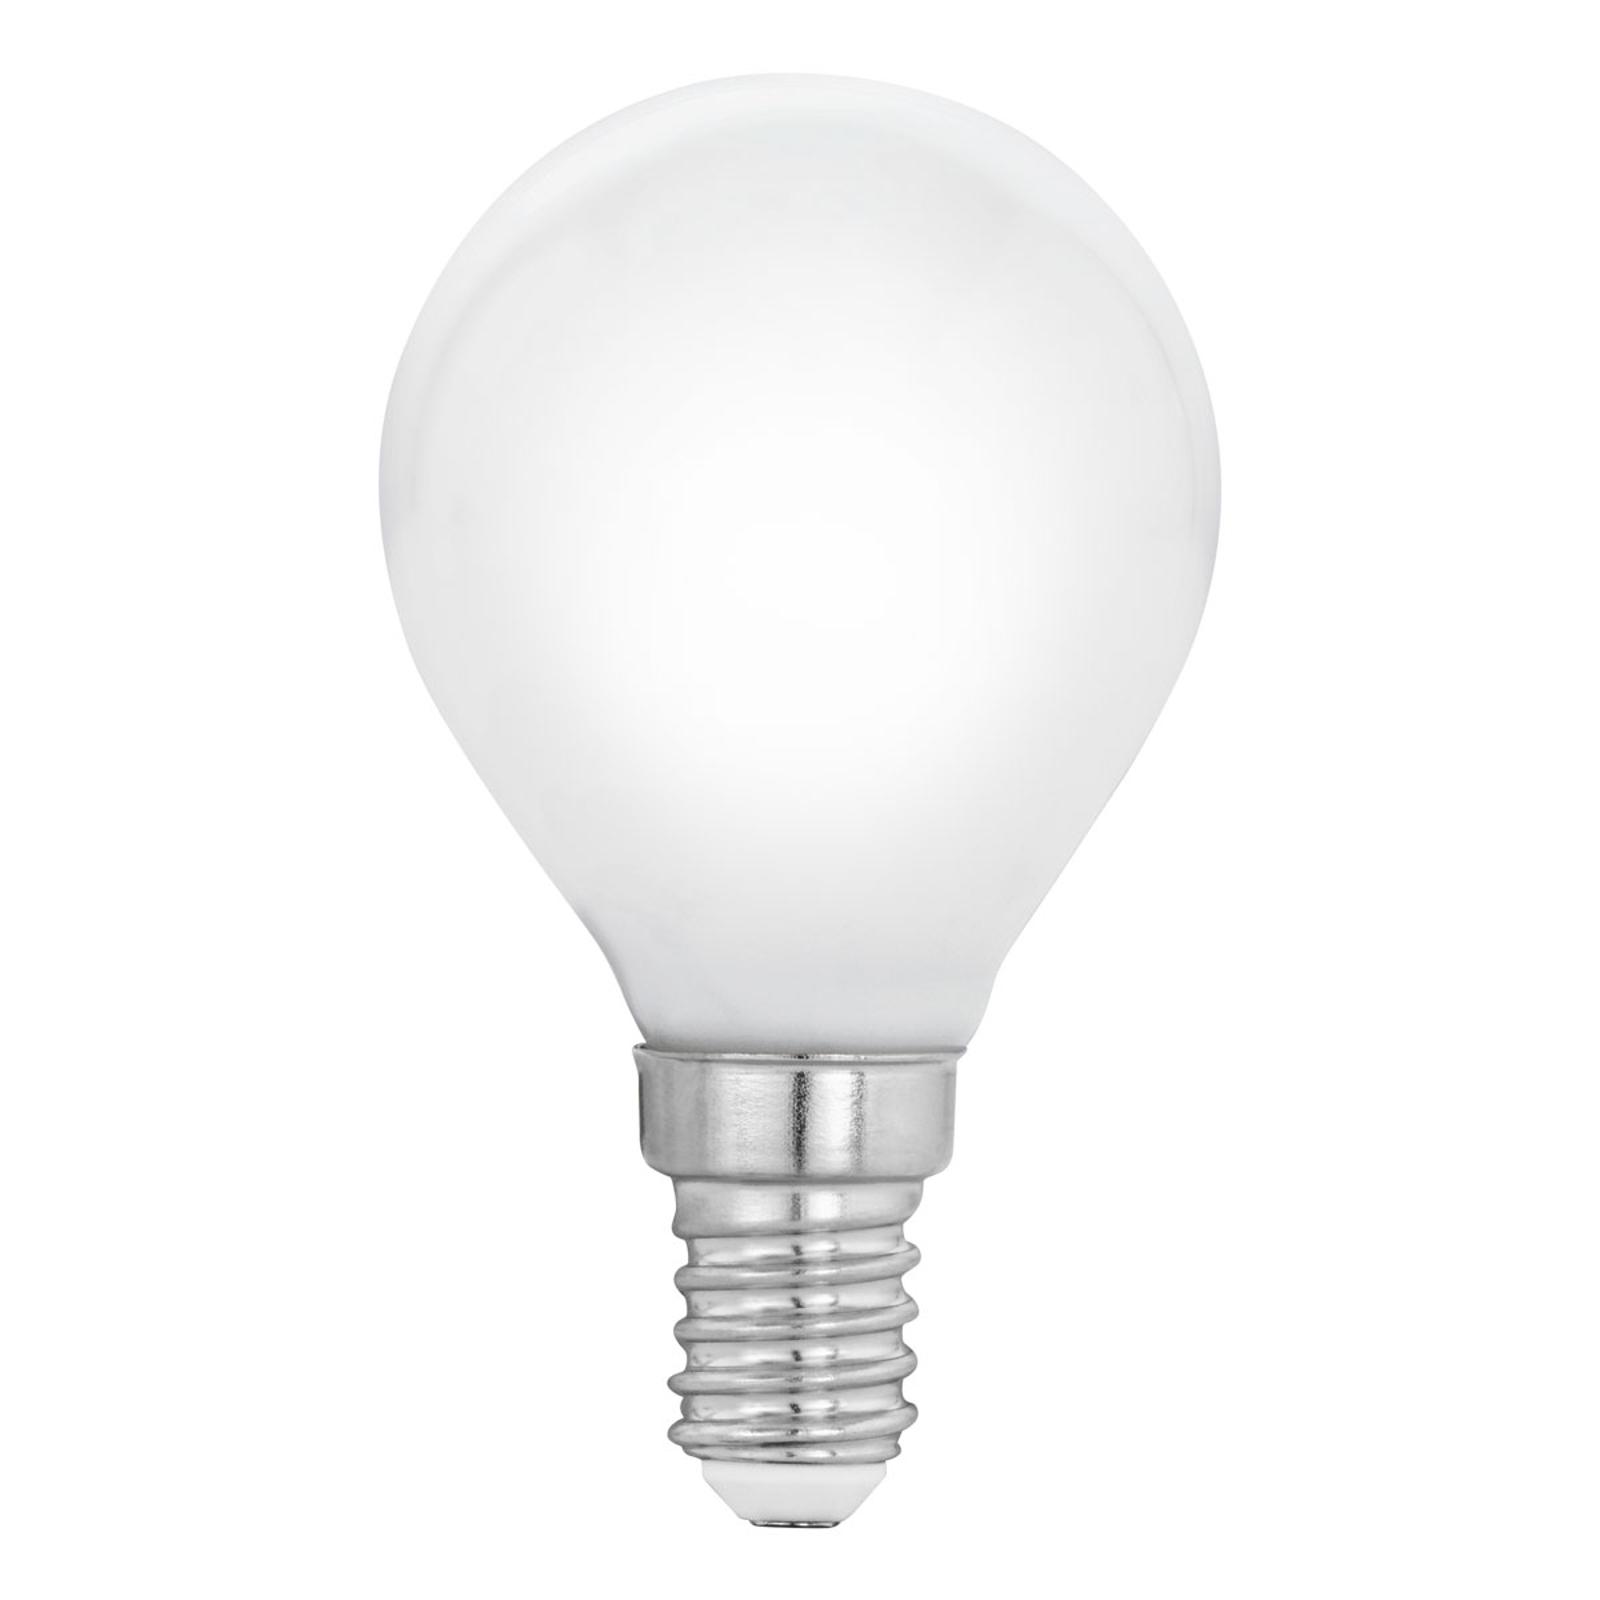 Żarówka LED E14 P45 4W, ciepła biel, matowa